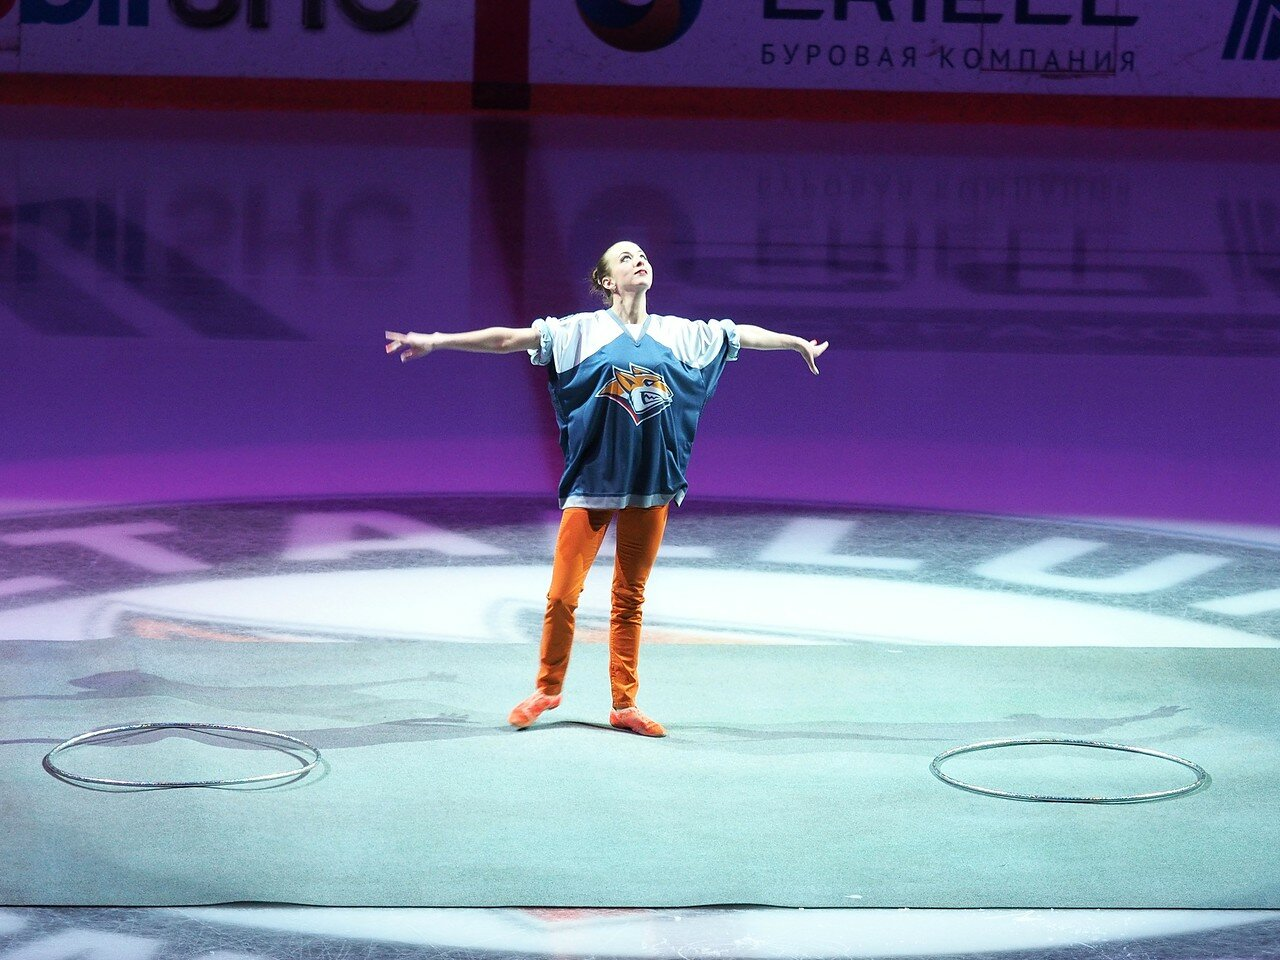 54Плей-офф 2016 Восток Финал Металлург - Салават Юлаев 23.03.2016